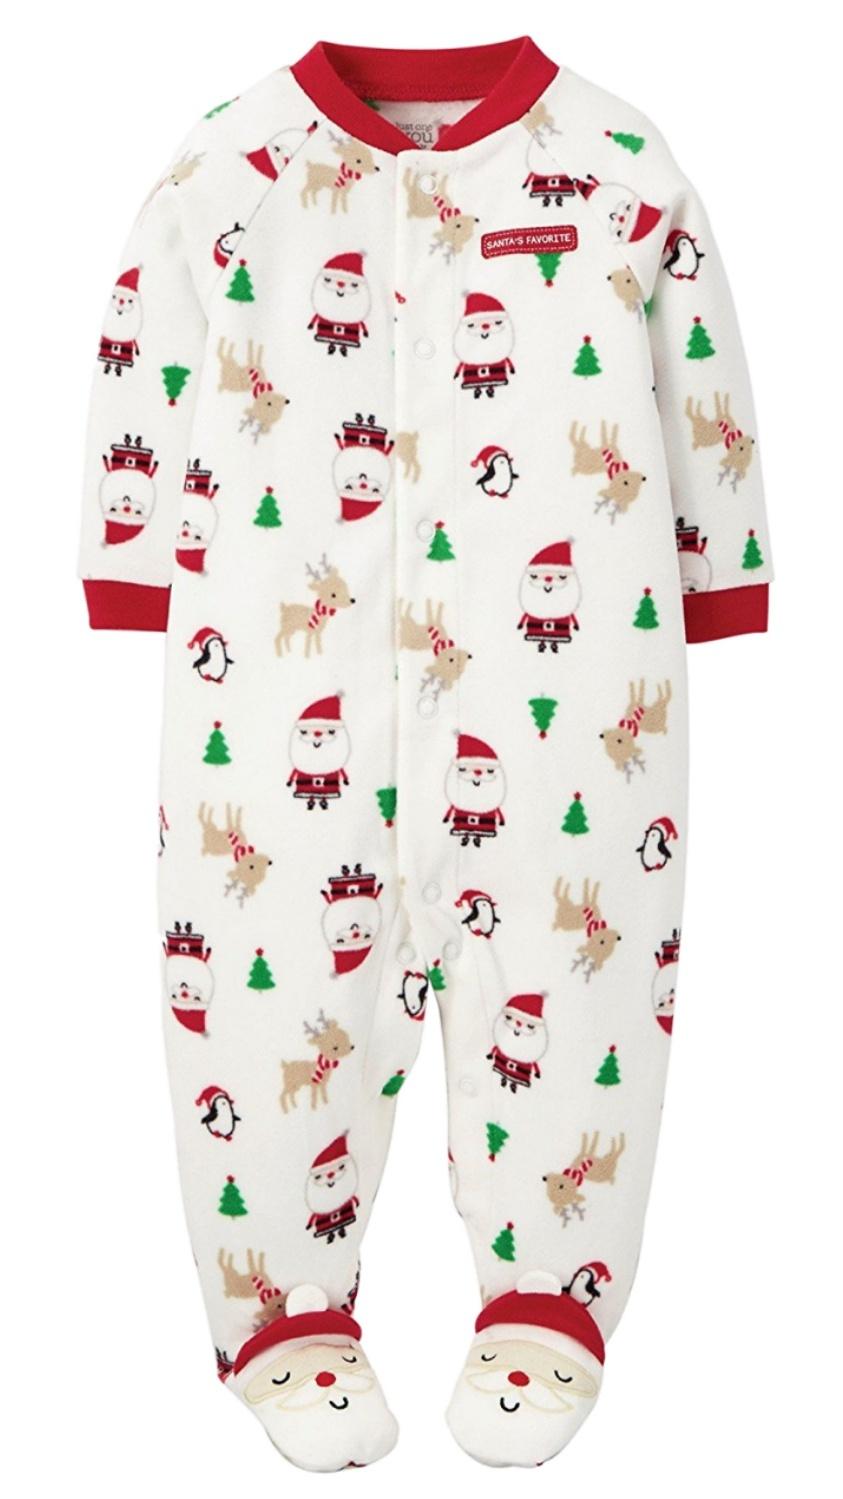 Carter\'s - Carters Infant Boy White Fleece Santas Favorite Christmas ...